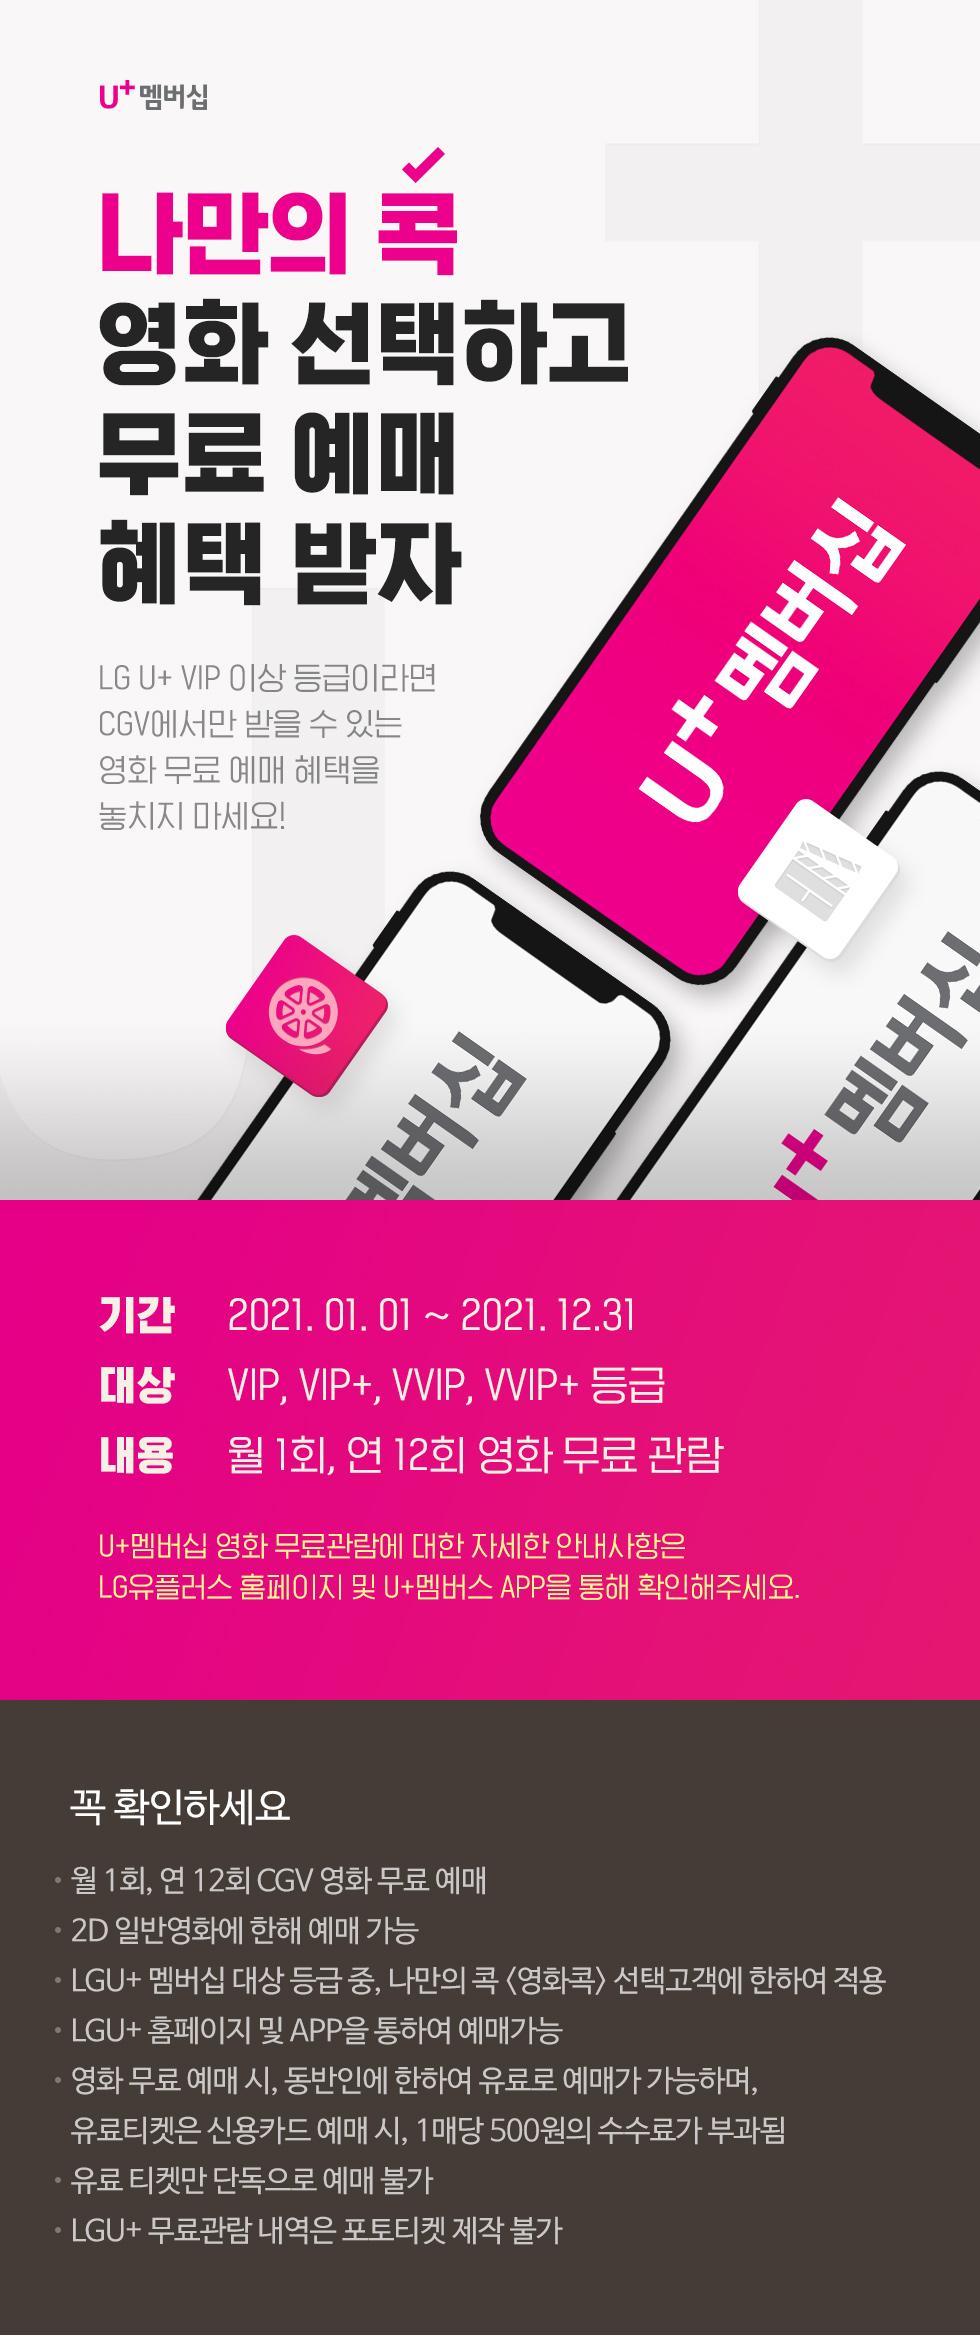 PUB이벤트 LG U+ 나만의 콕으로 영화 무료 콕!